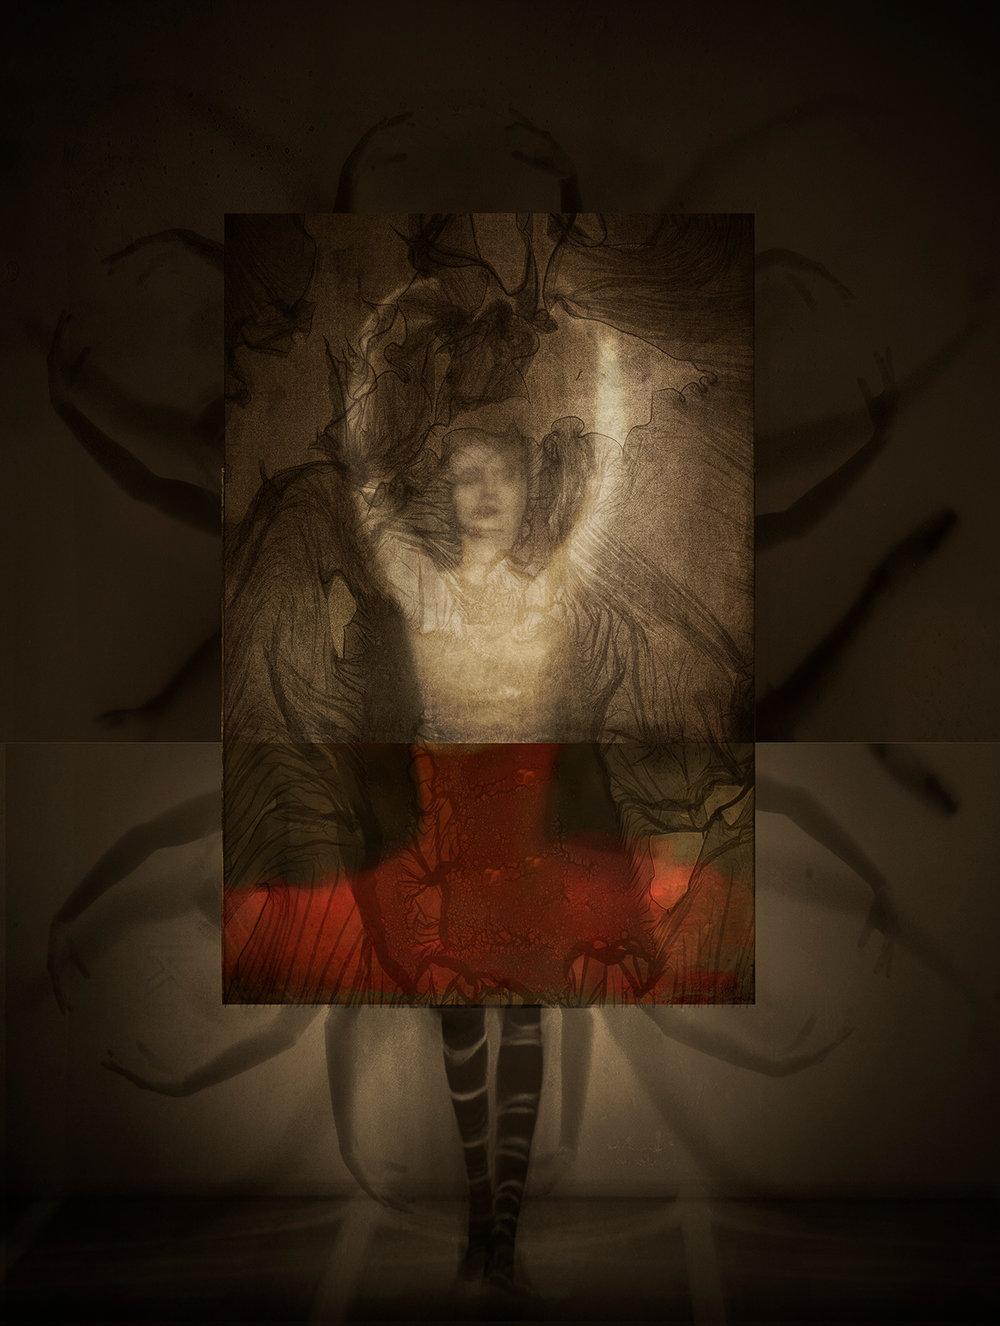 Eduardo_Fujii_Uncertain-Nature-of-Reality_Superposition_03.jpg